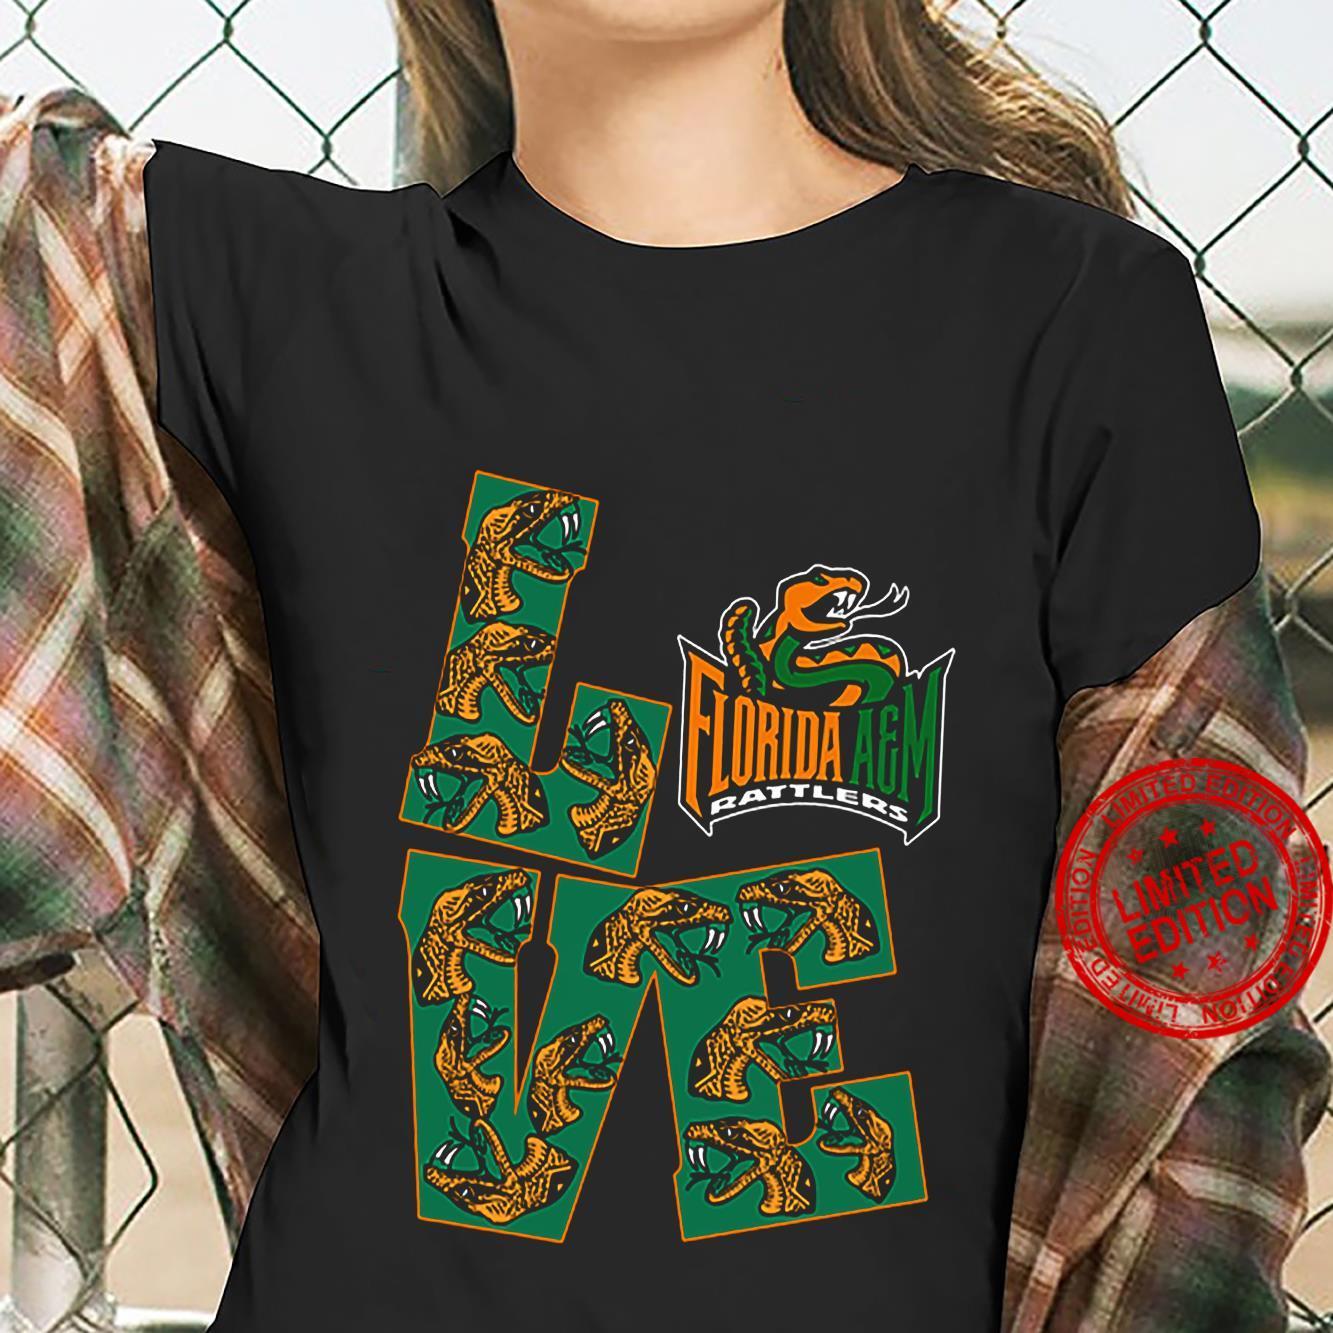 Love Florida A&M Rattlers Shirt ladies tee